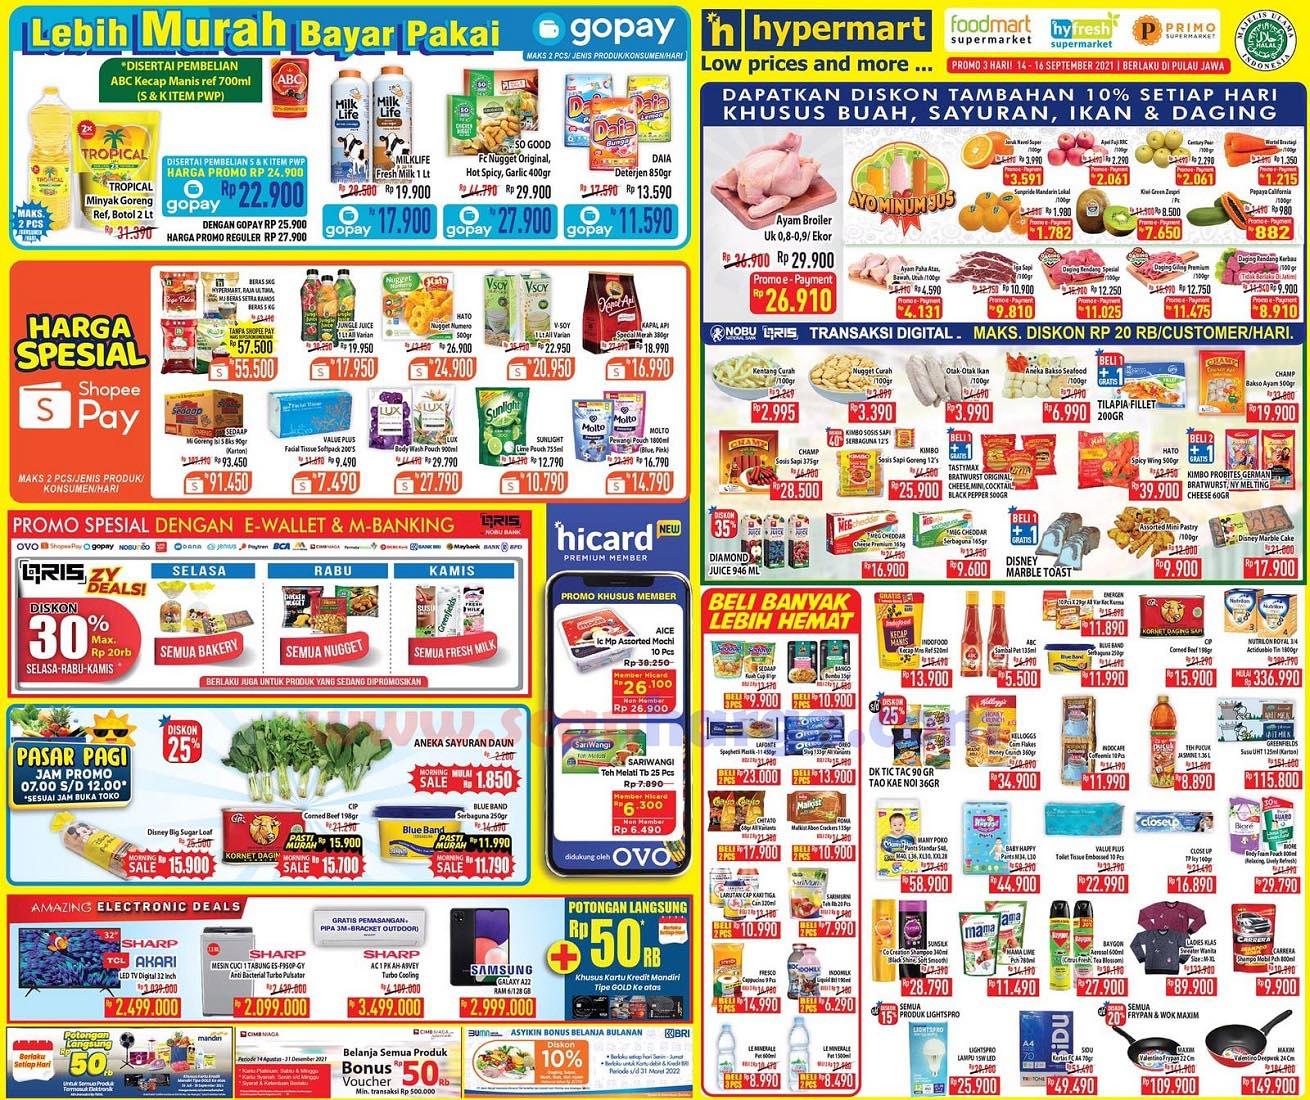 Katalog Promo Hypermart Weekday Terbaru 14 - 16 September 2021